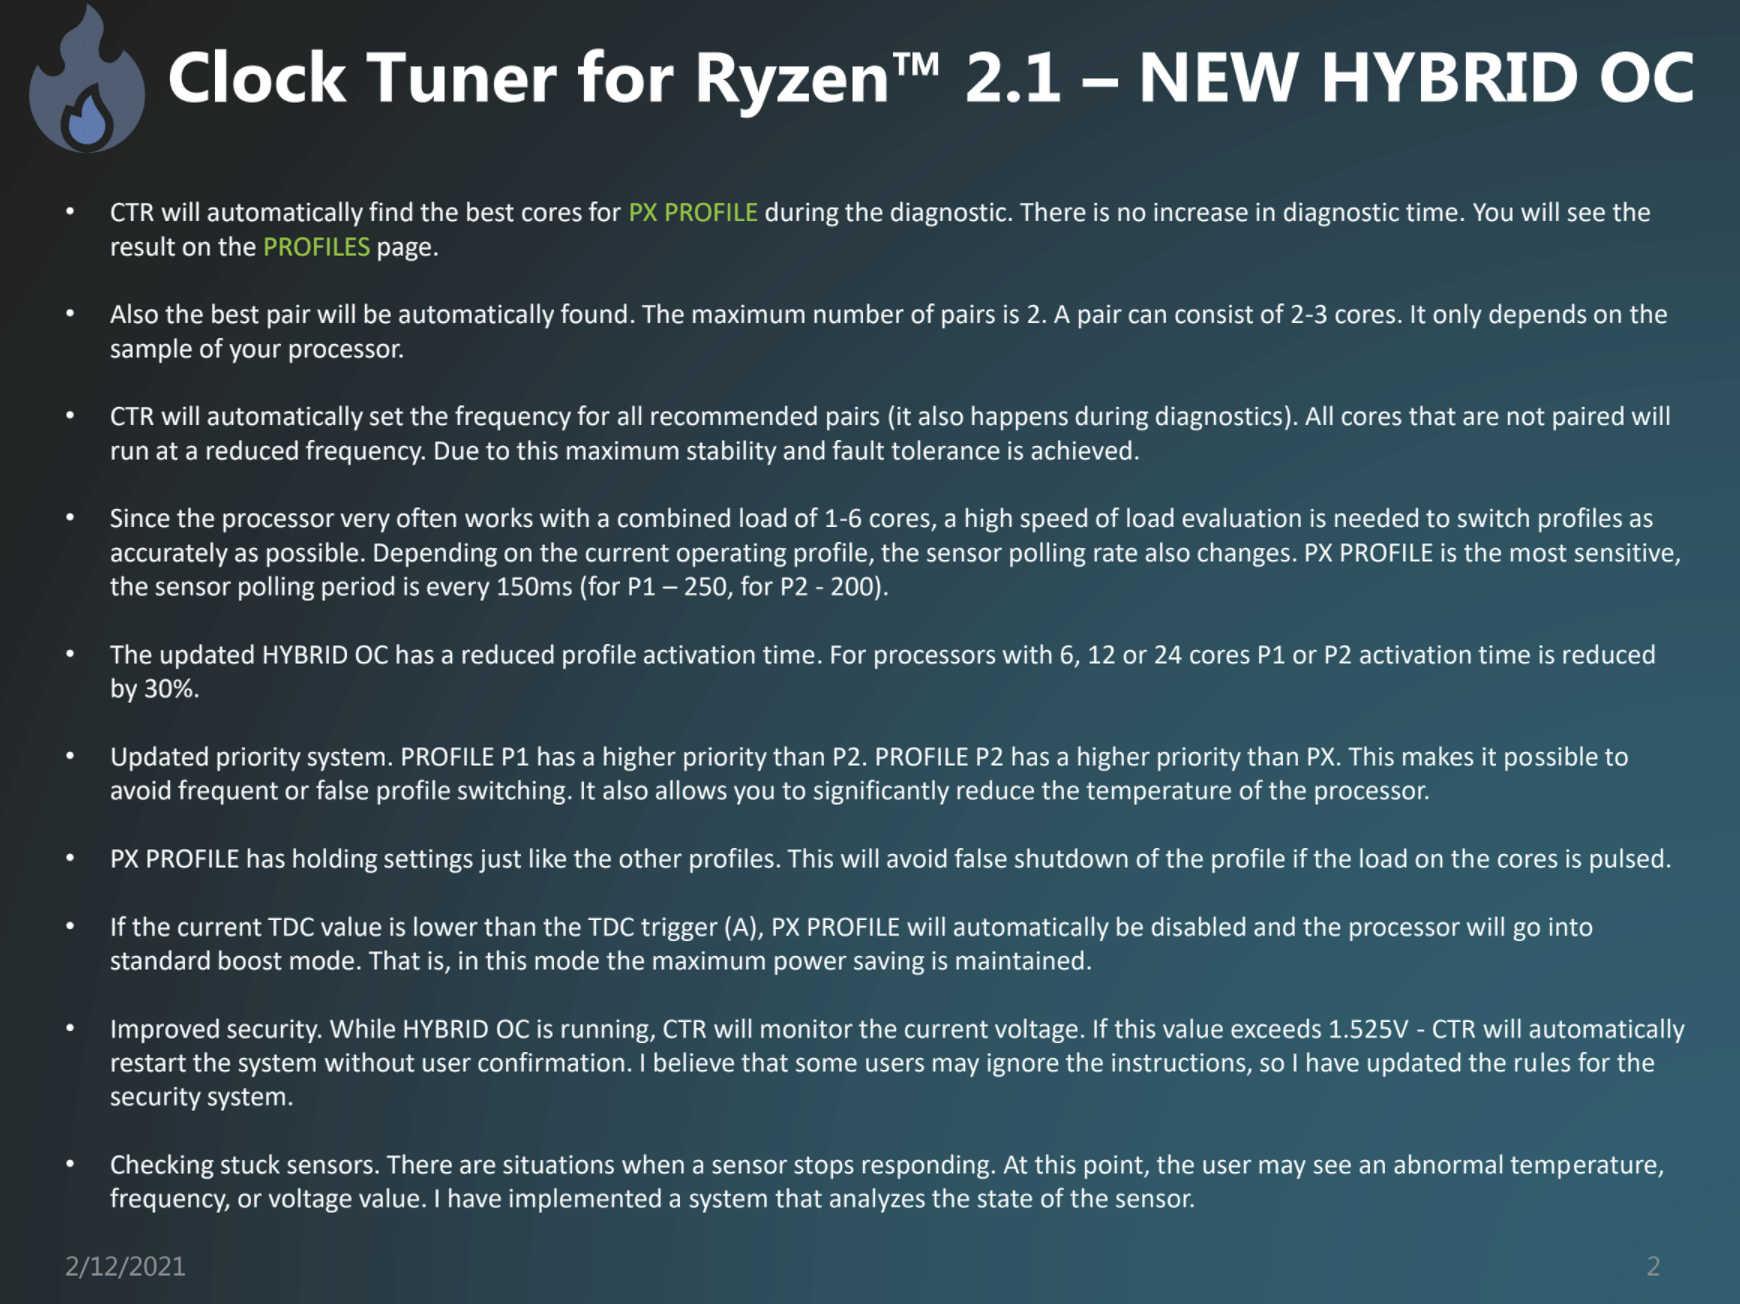 Clocktuner For Ryzen 2.1 Ctr Tool Hybrid Oc Ryzen 5000 Trigger